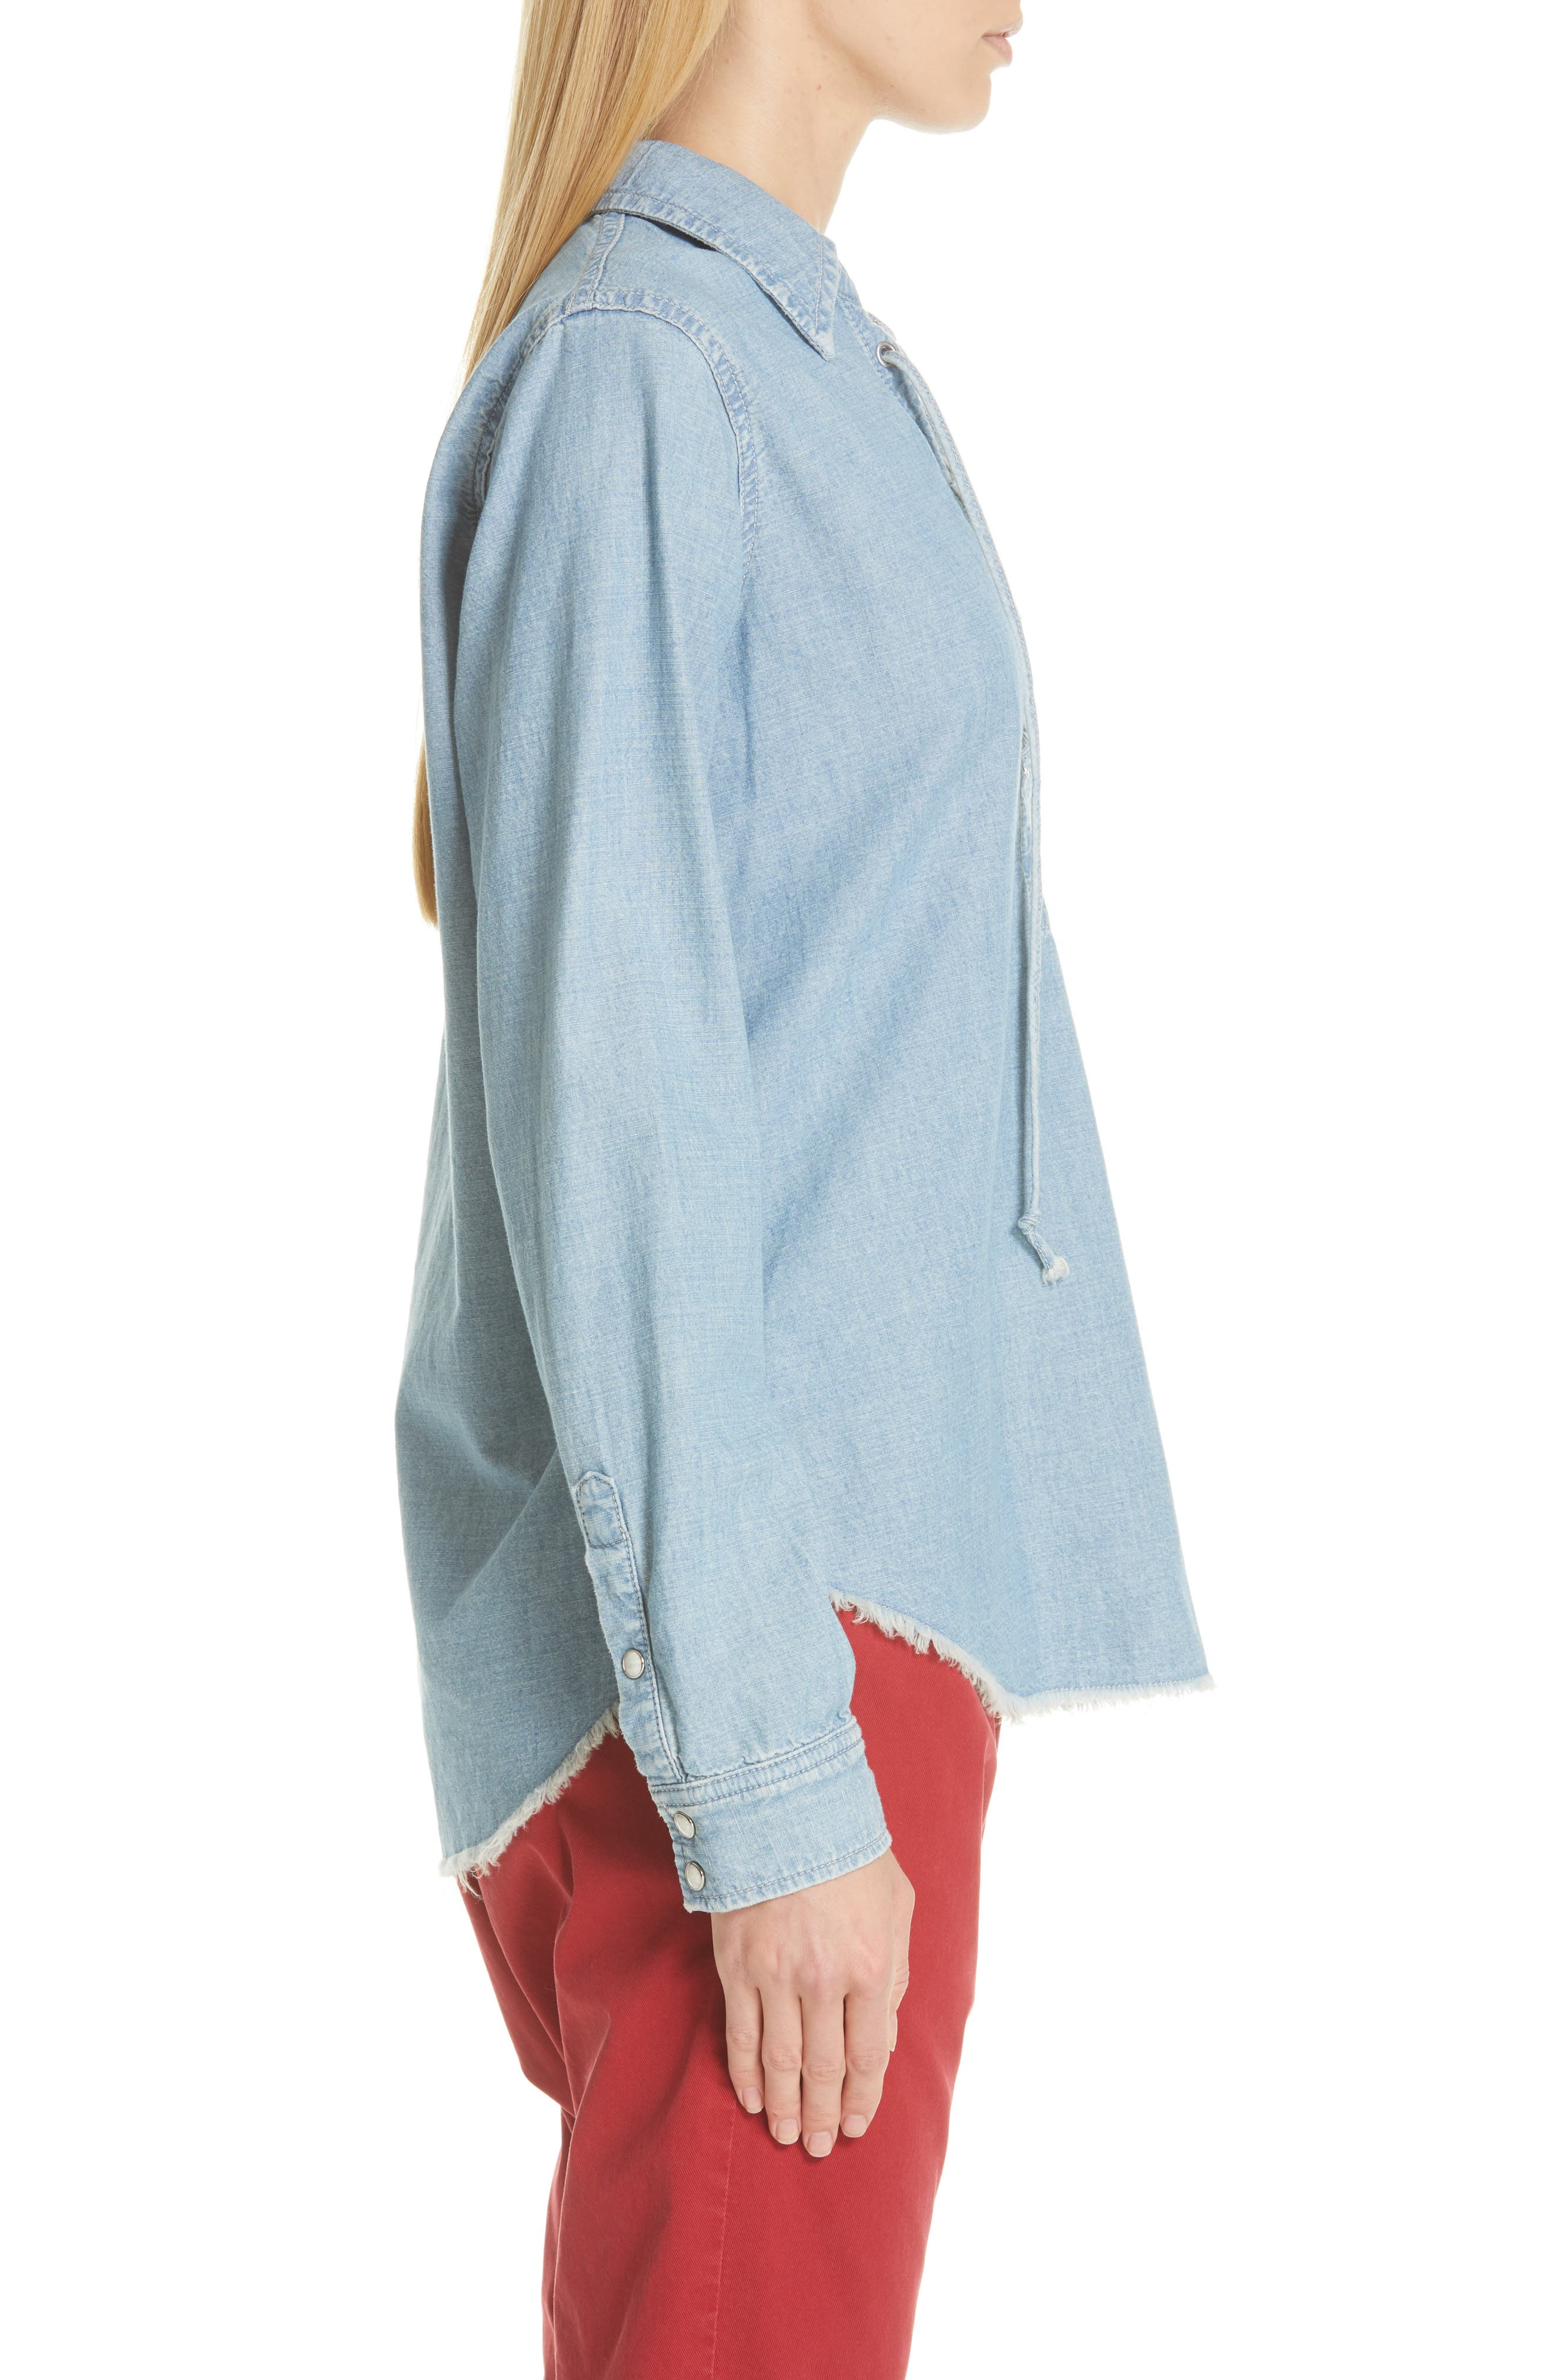 NILI LOTAN, Mallory Chambray Shirt, Alternate thumbnail 3, color, SKY BLUE